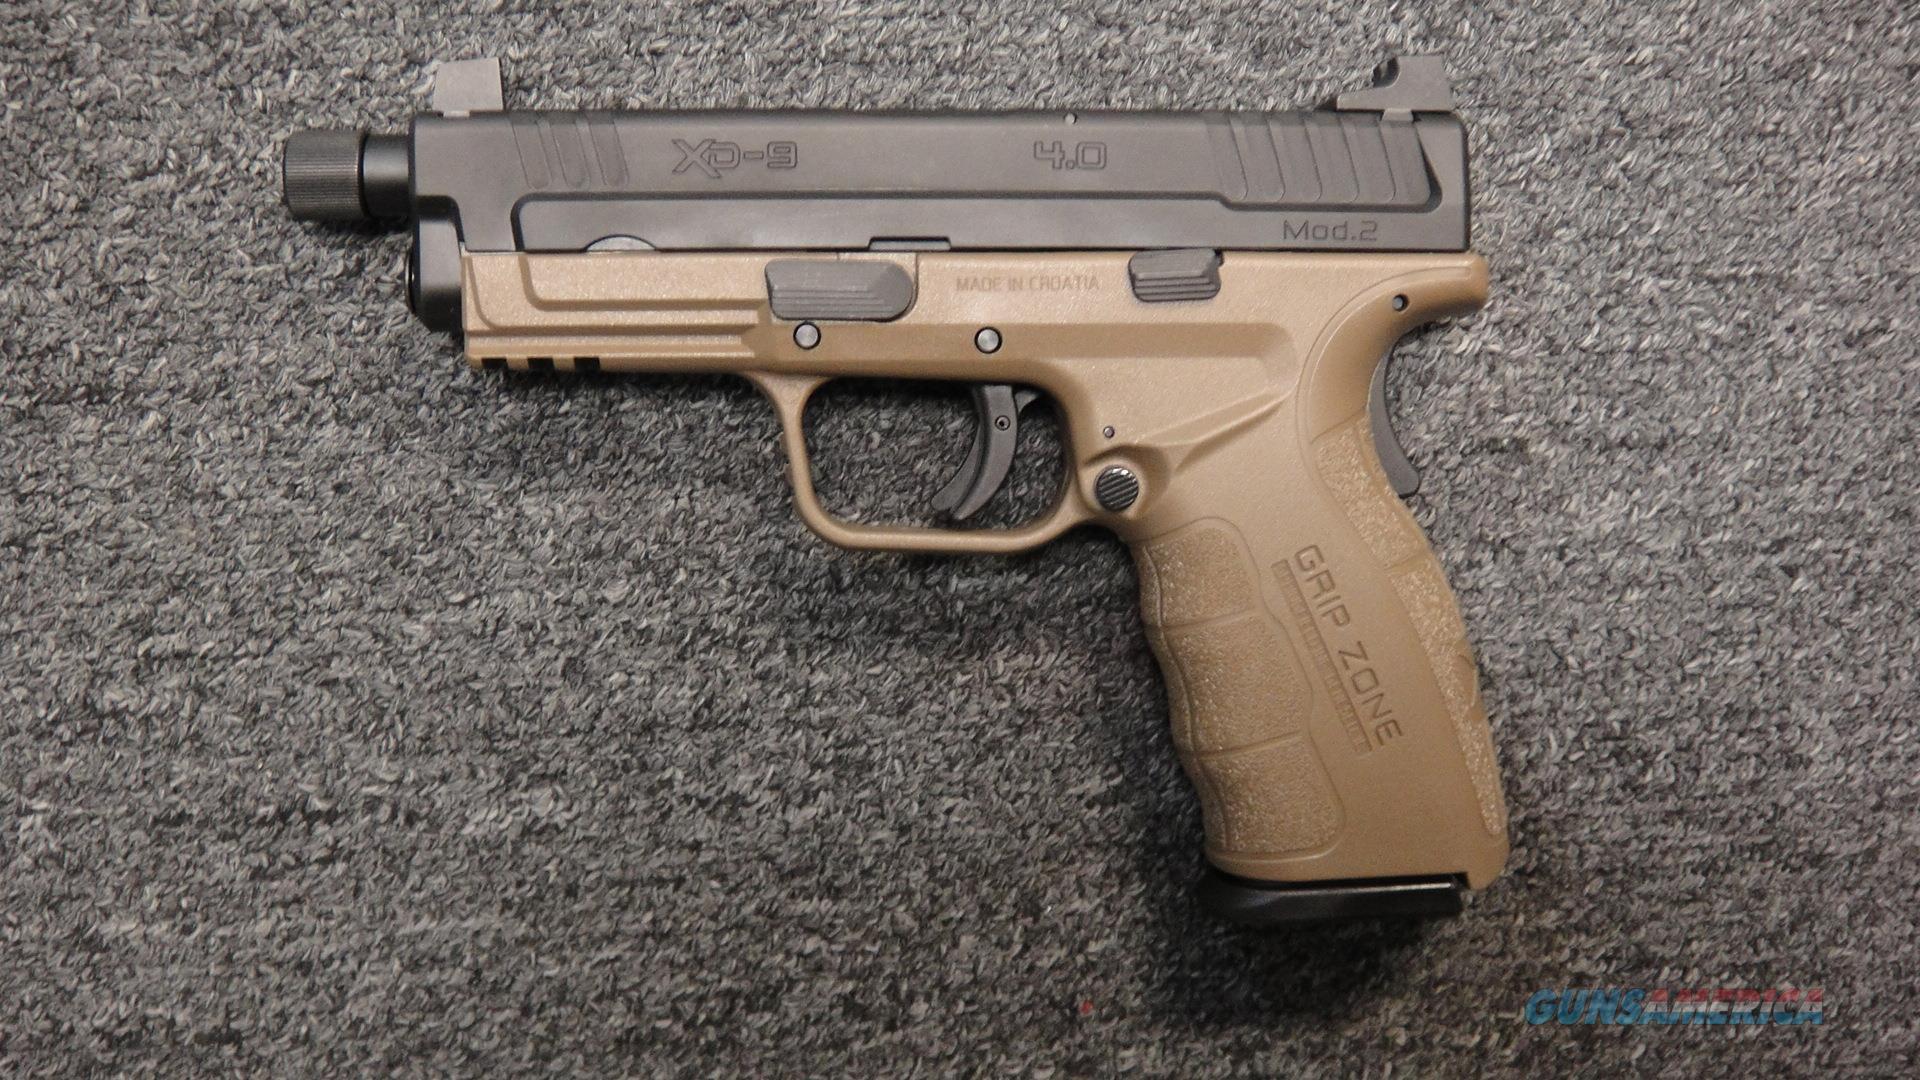 Springfield Armory XD-9 Mod 2 FDE Threaded (used)  Guns > Pistols > Springfield Armory Pistols > XD-Mod.2